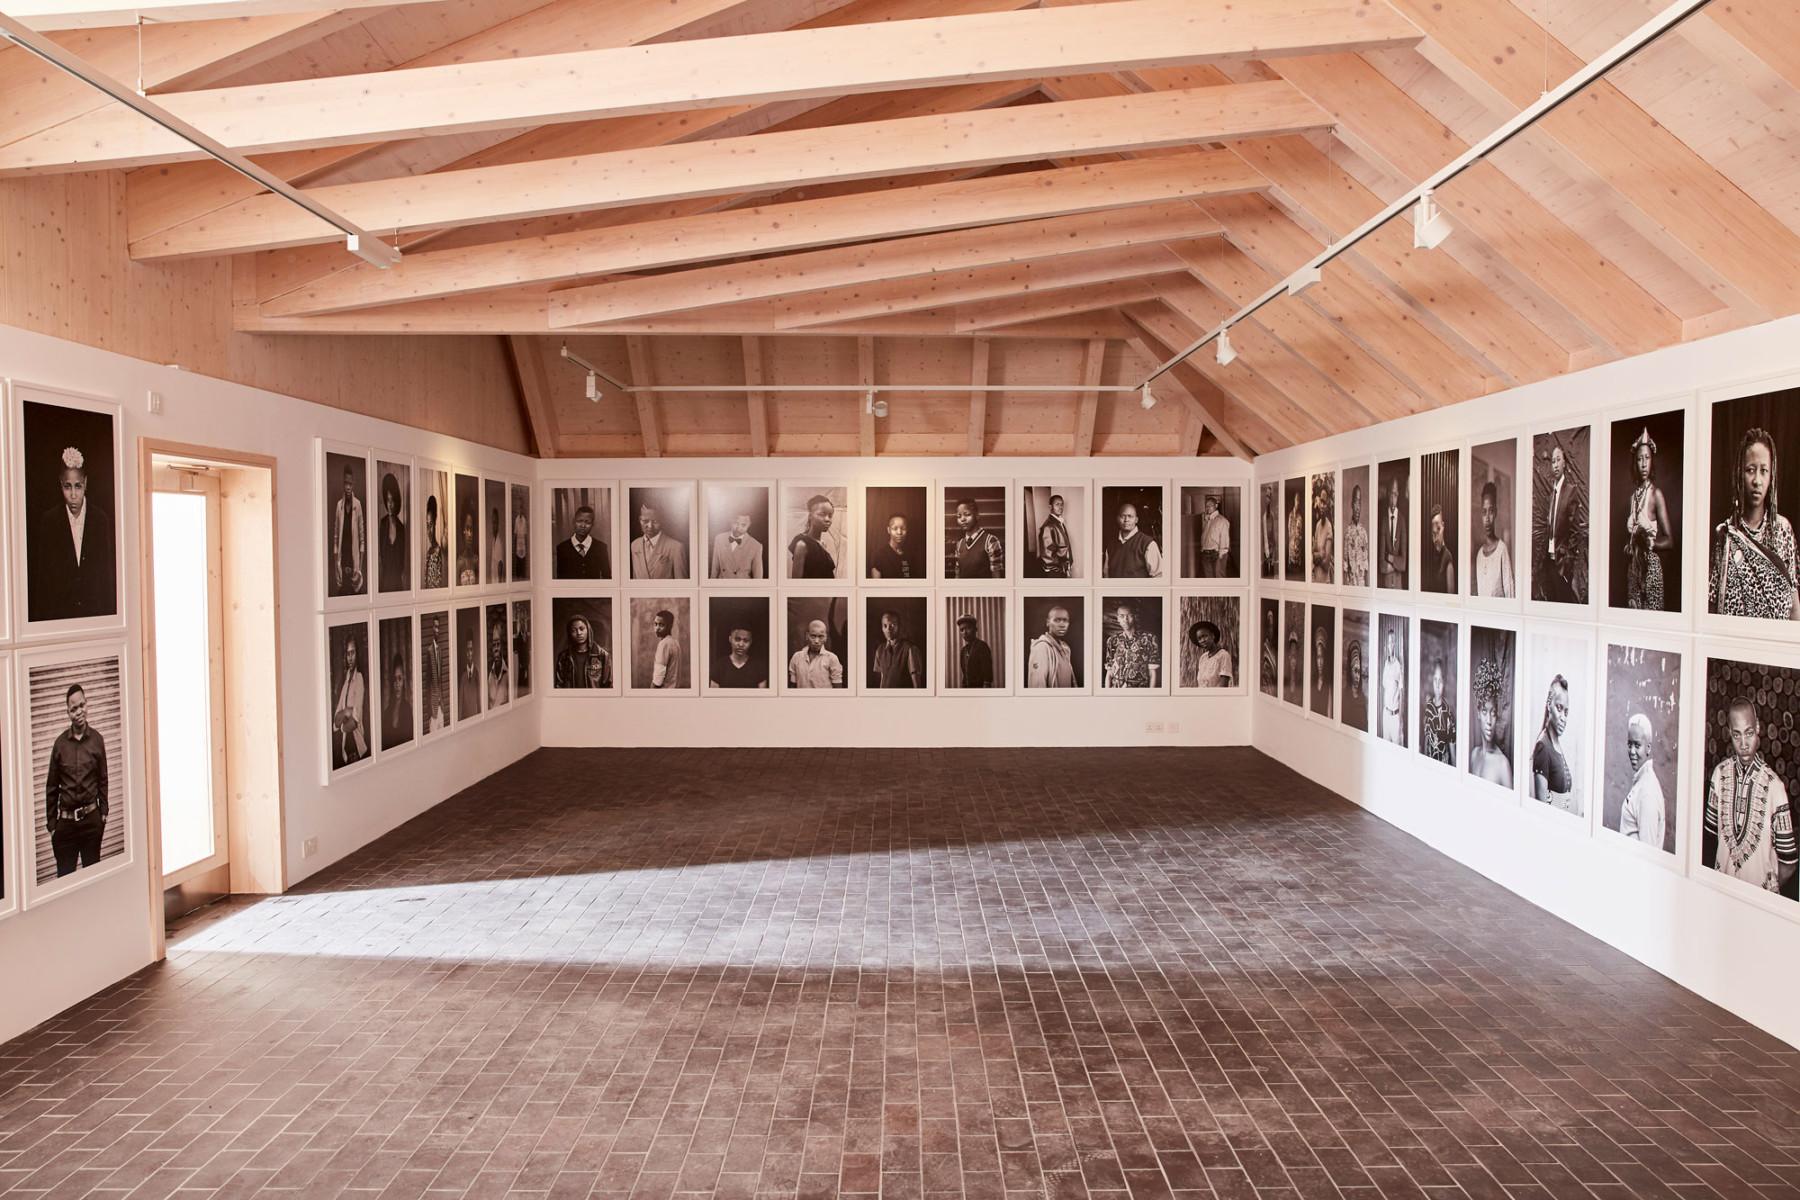 Alun-Callender Charleston barns exhibition-Centre-jamie-fobert-architects